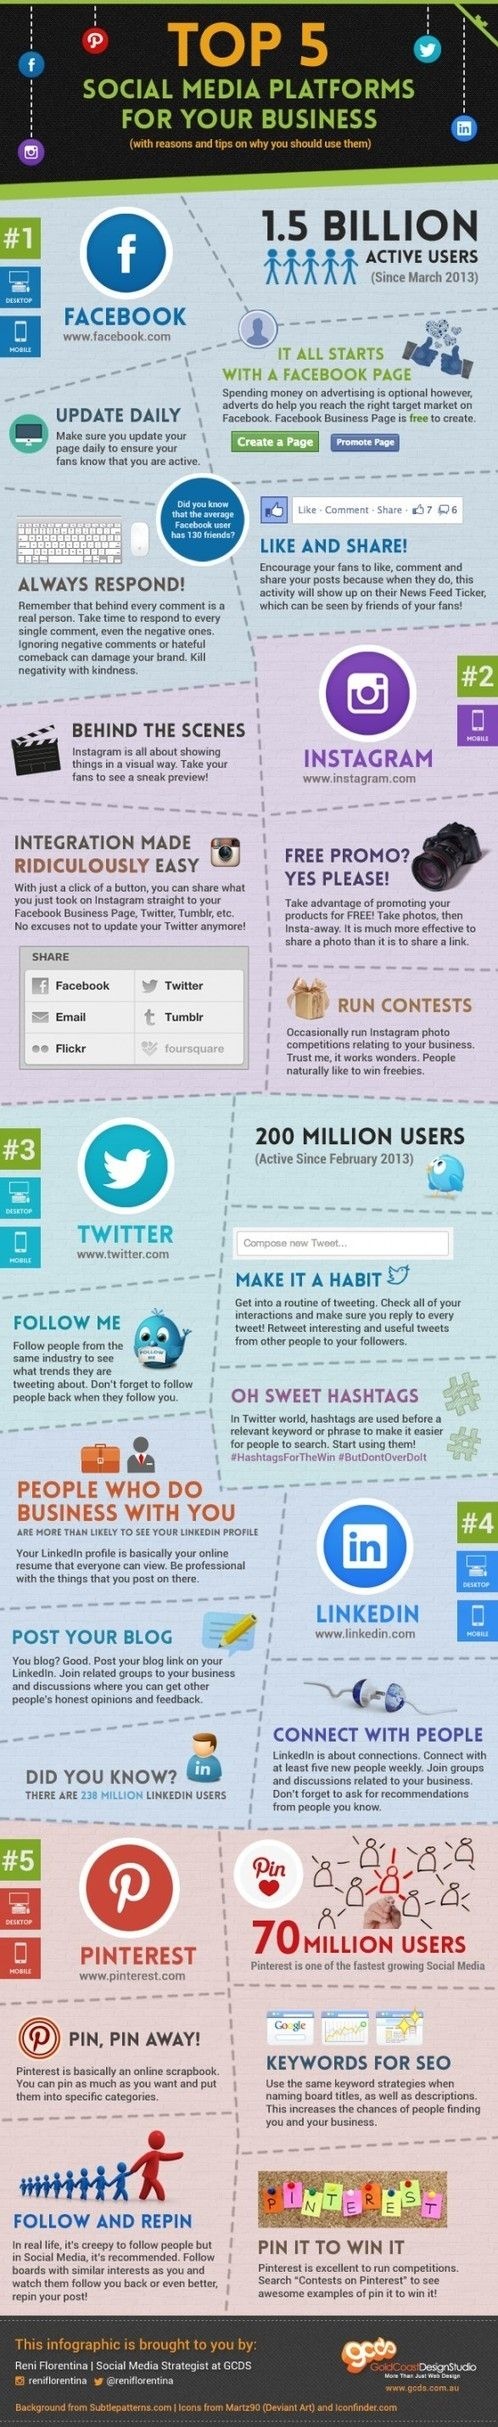 Top 5 Social Media Platforms for Business #socialmedia #smm #business